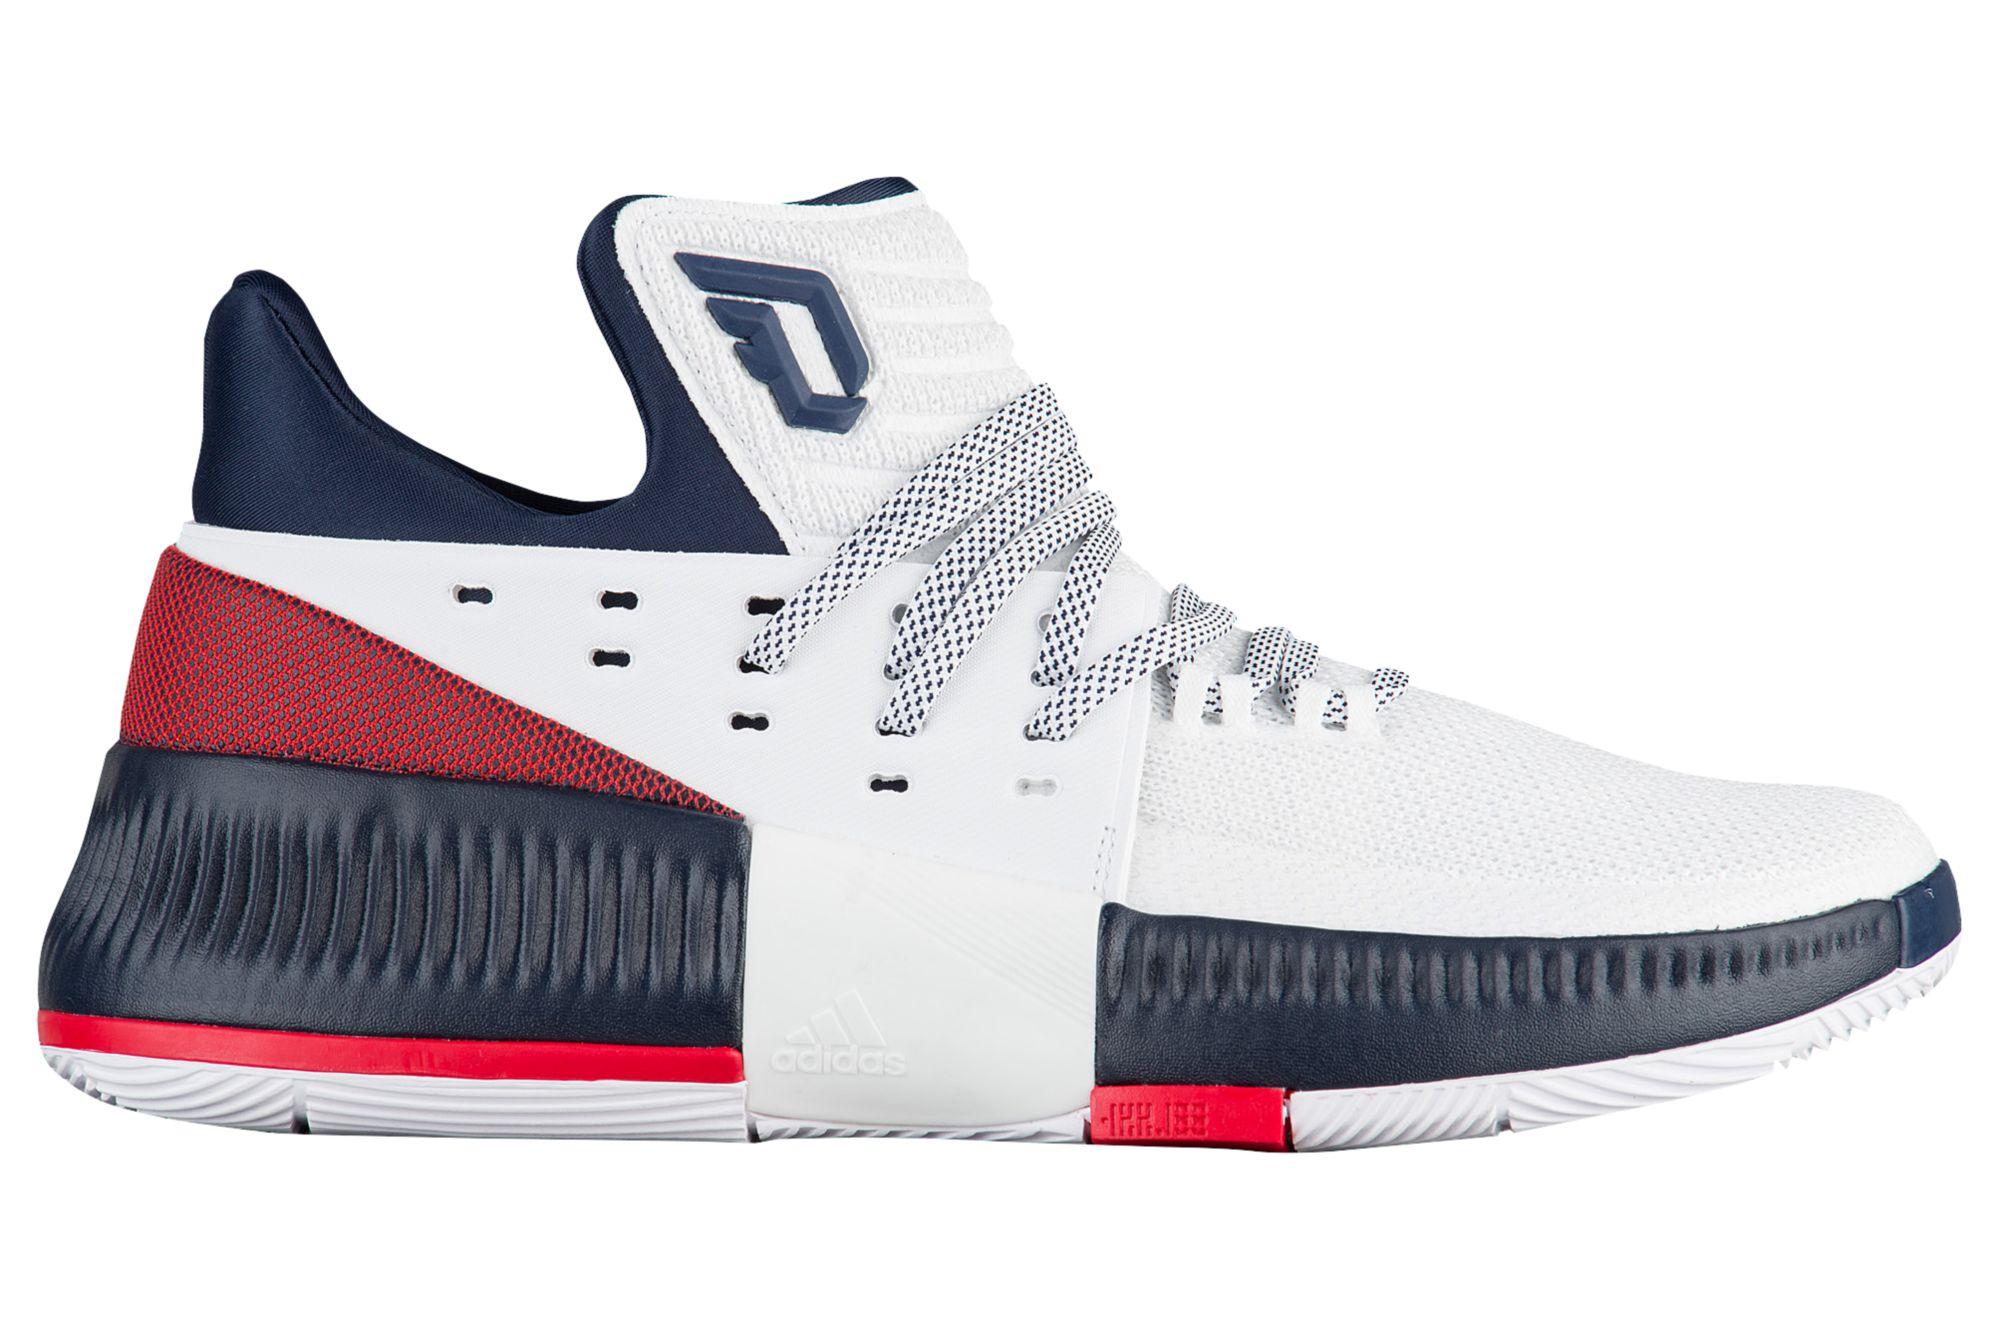 ba2b2db1e5d079 adidas   Kicks On Court   Release Reminder ...